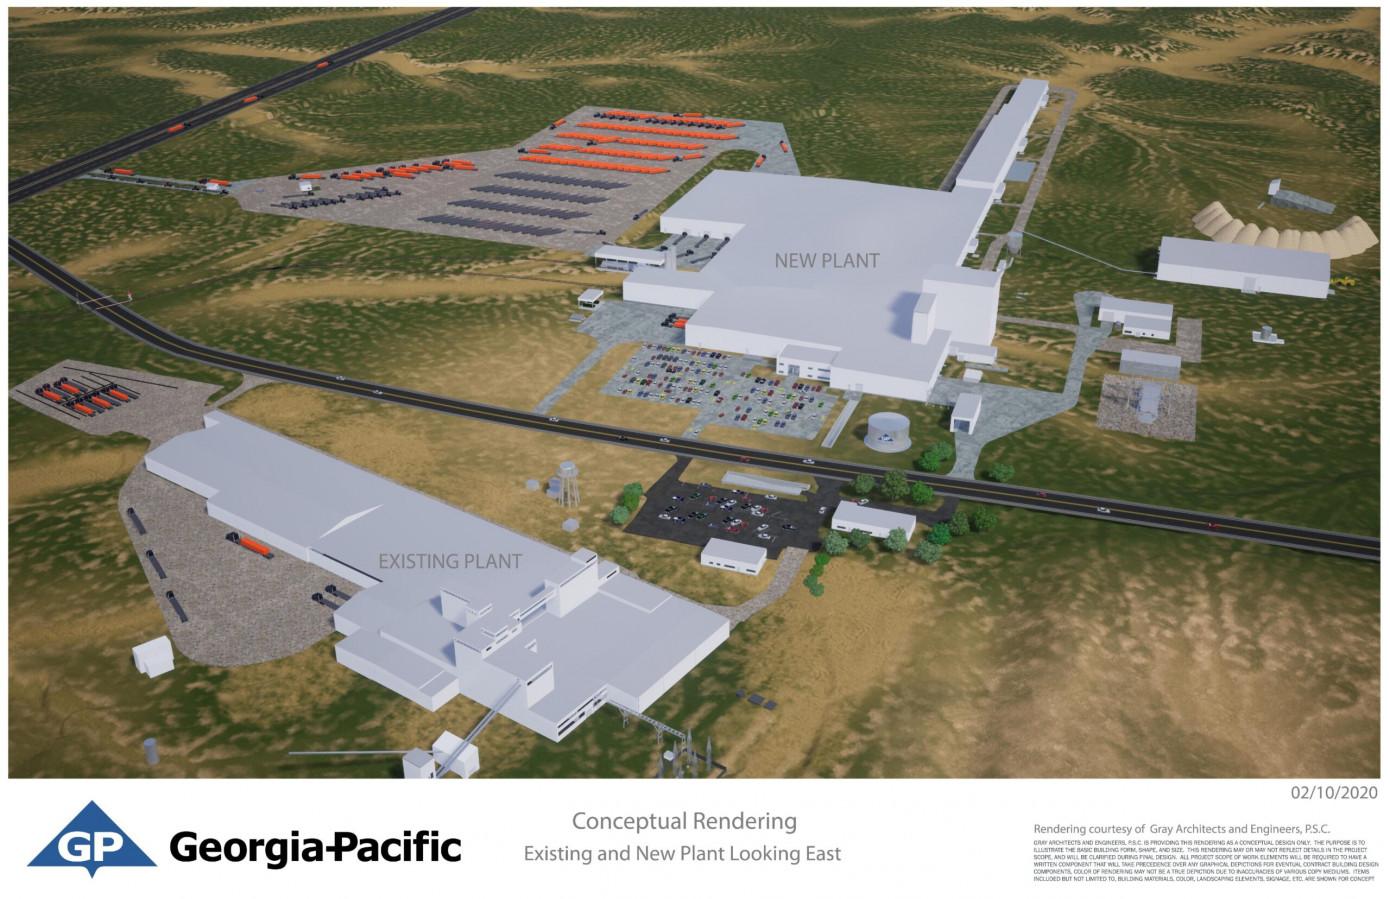 GP to build $285 million gypsum wallboard plant in Texas